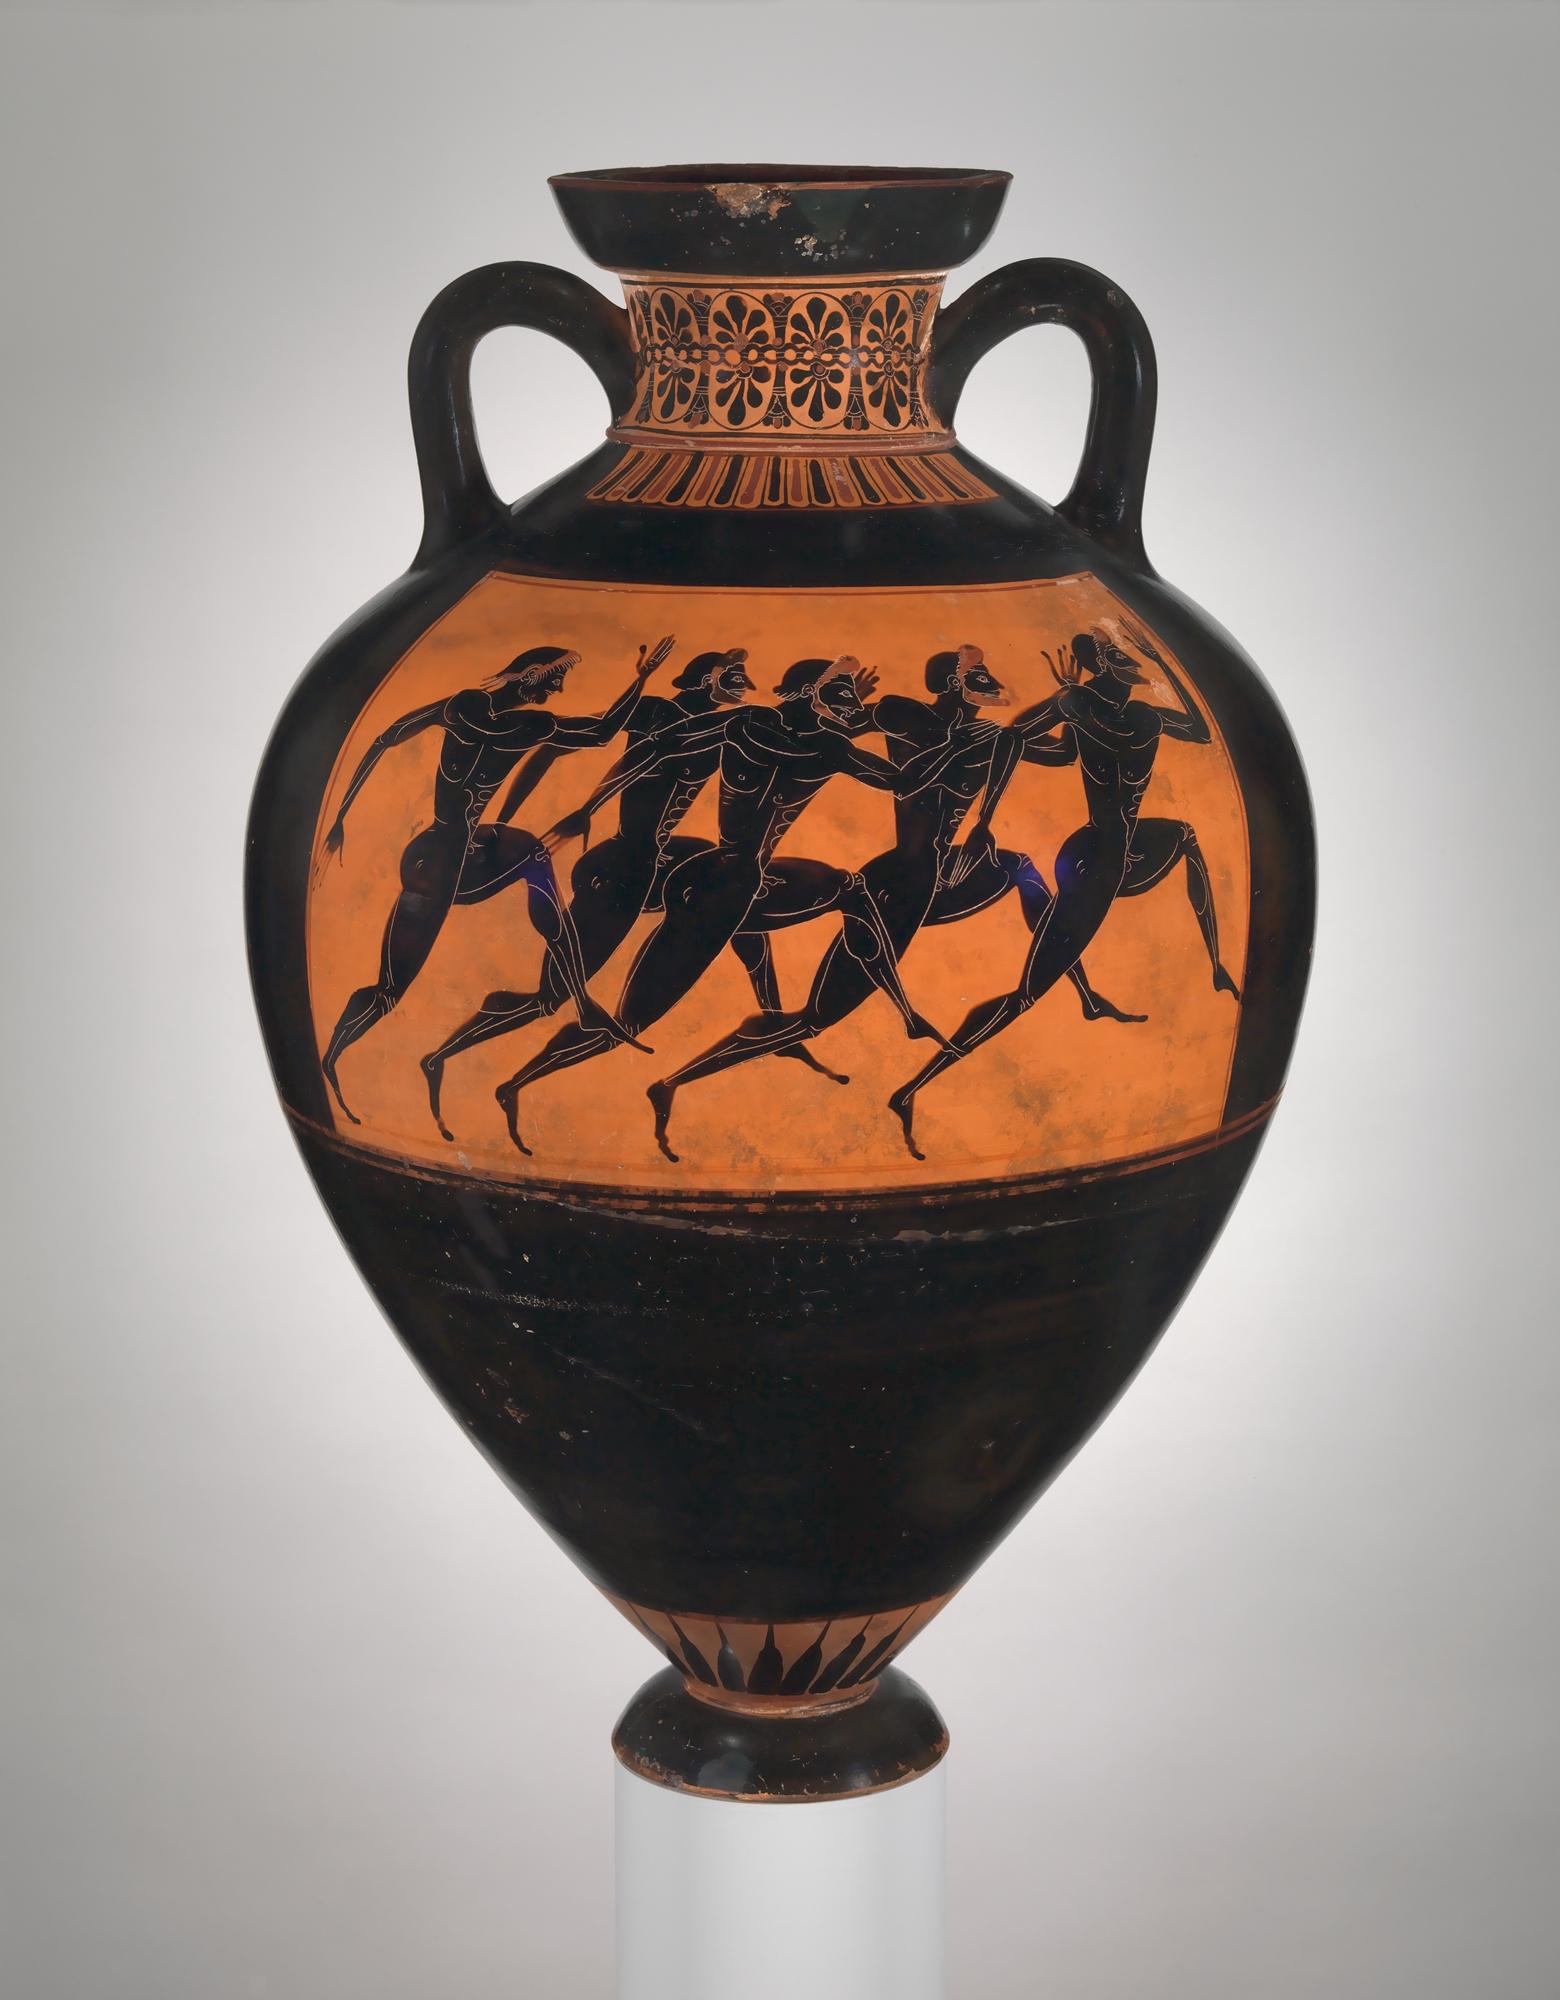 Terracotta Panathenaic prize amphora  Attributed to the Euphiletos Painter, 530 BC